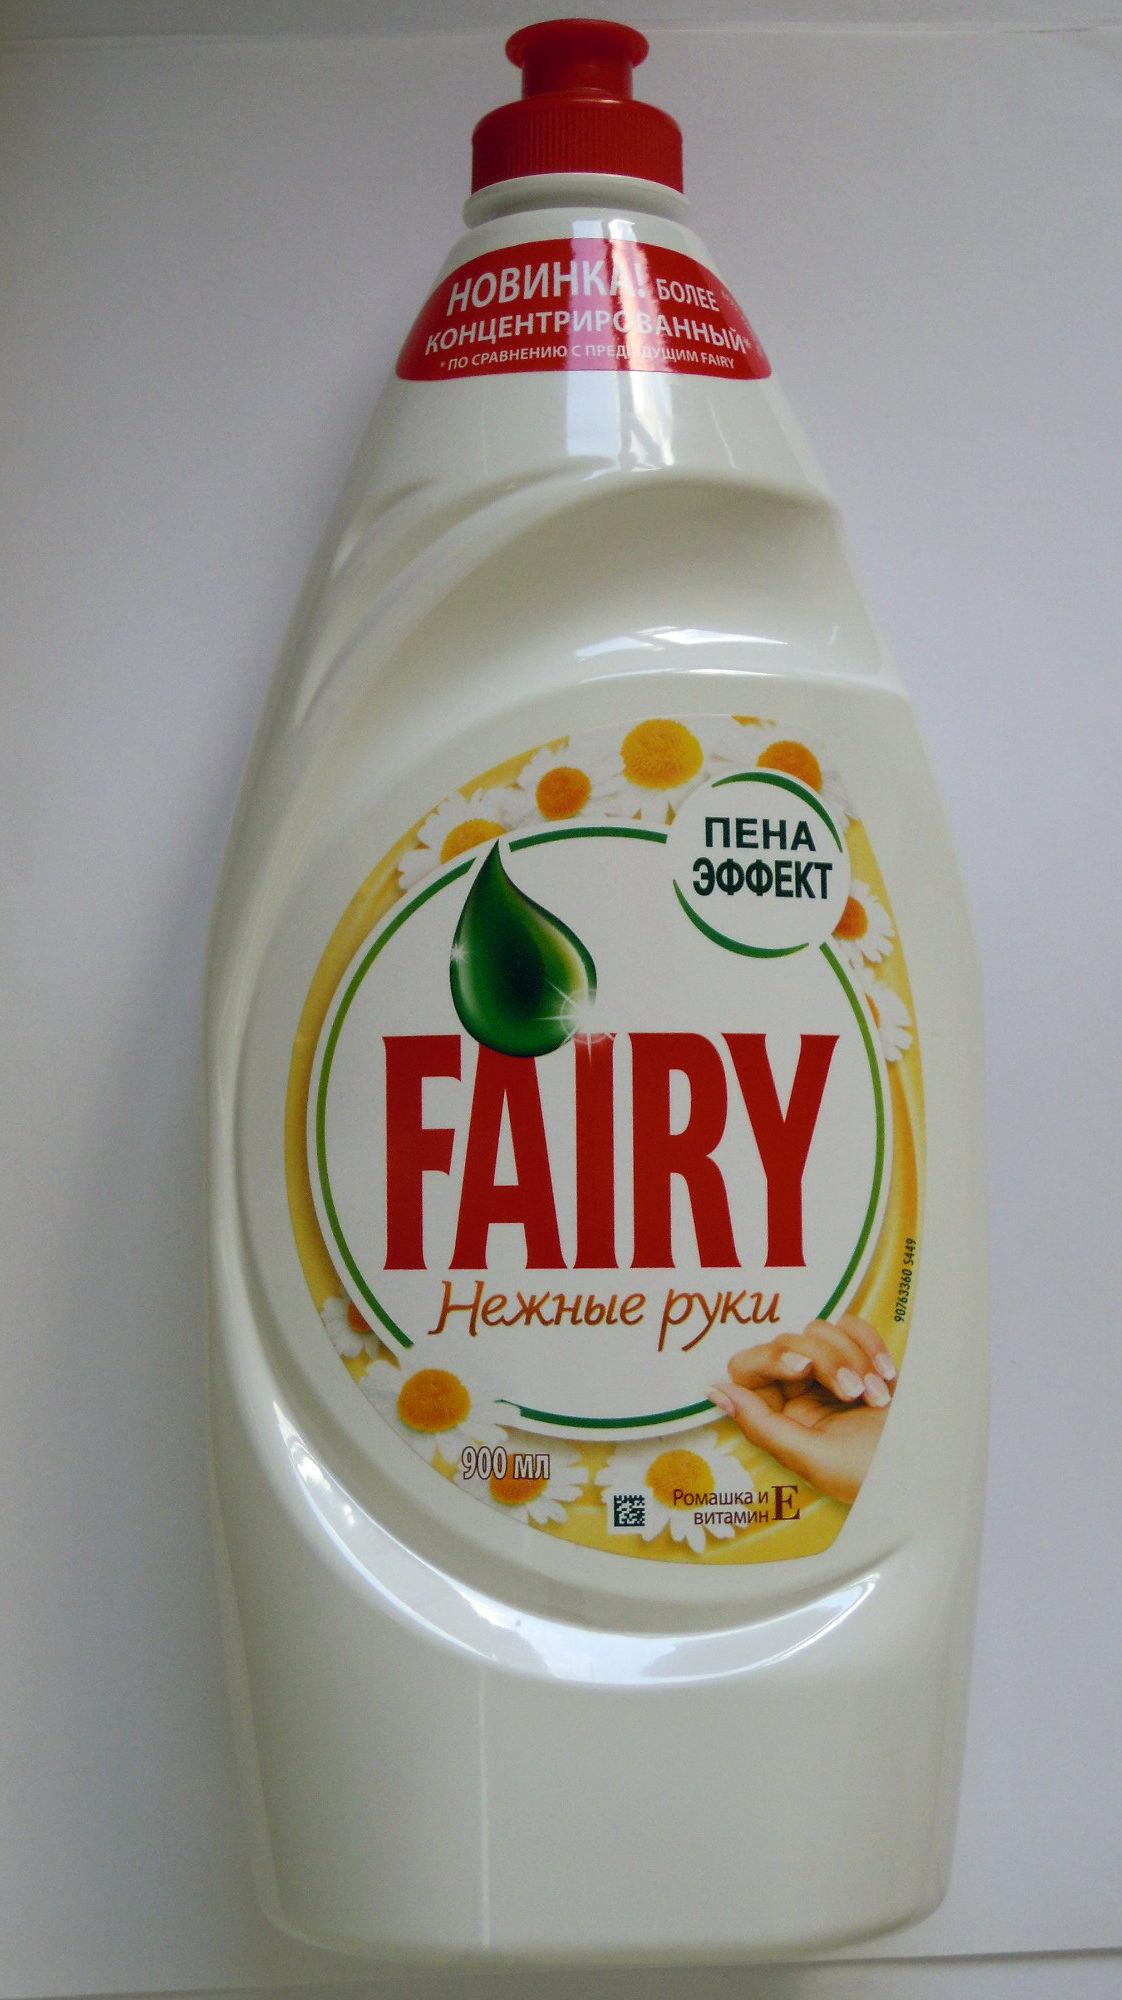 Нежные руки Ромашка и витамин E - Product - ru